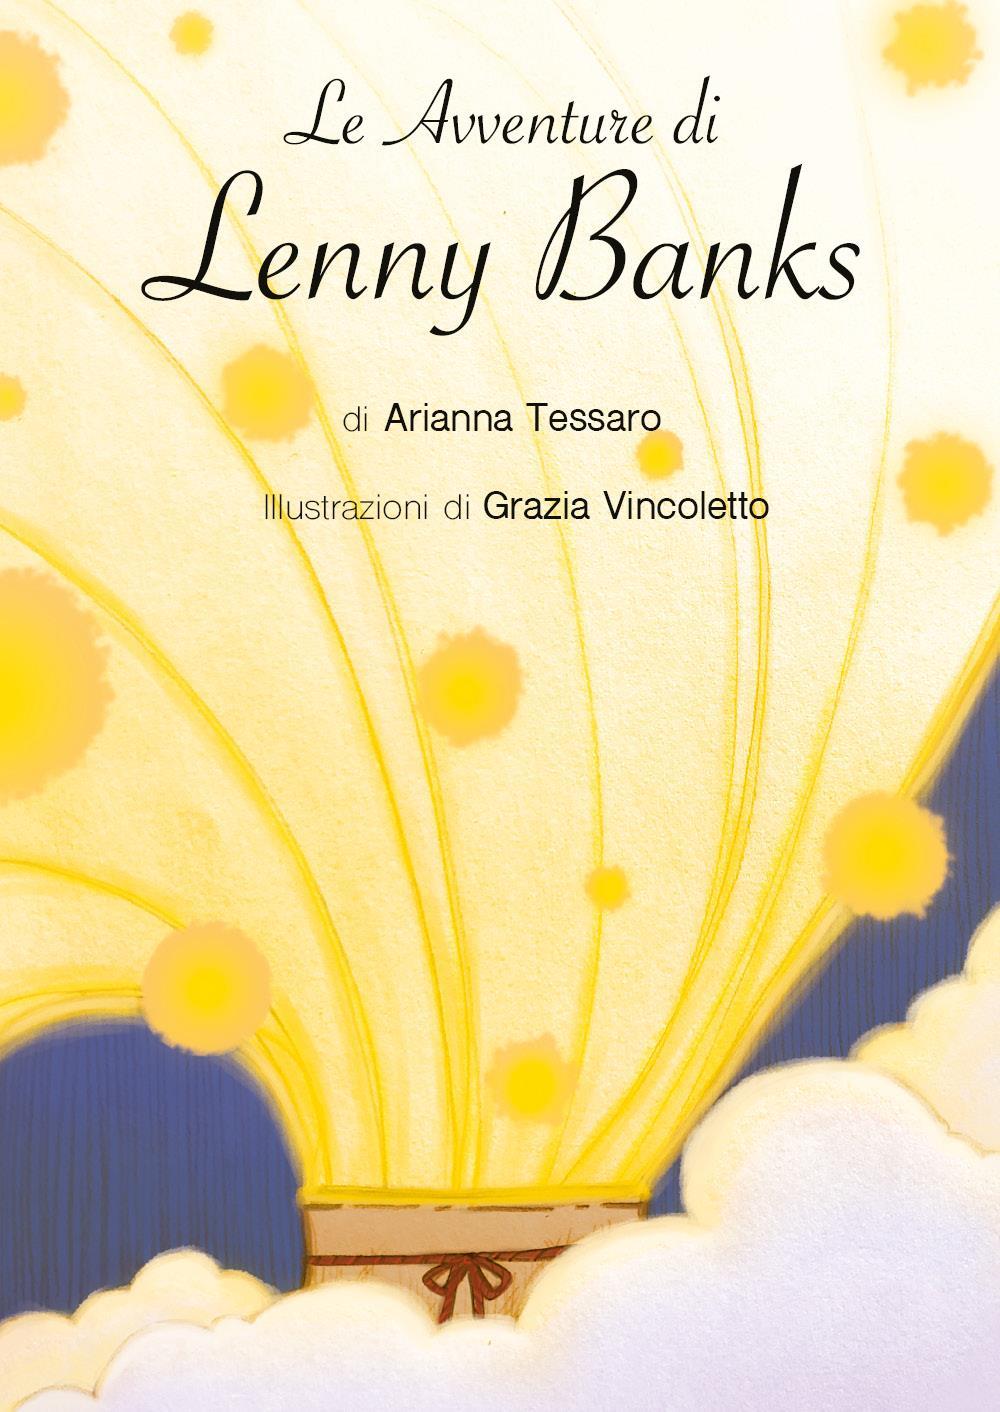 Le Avventure di Lenny Banks